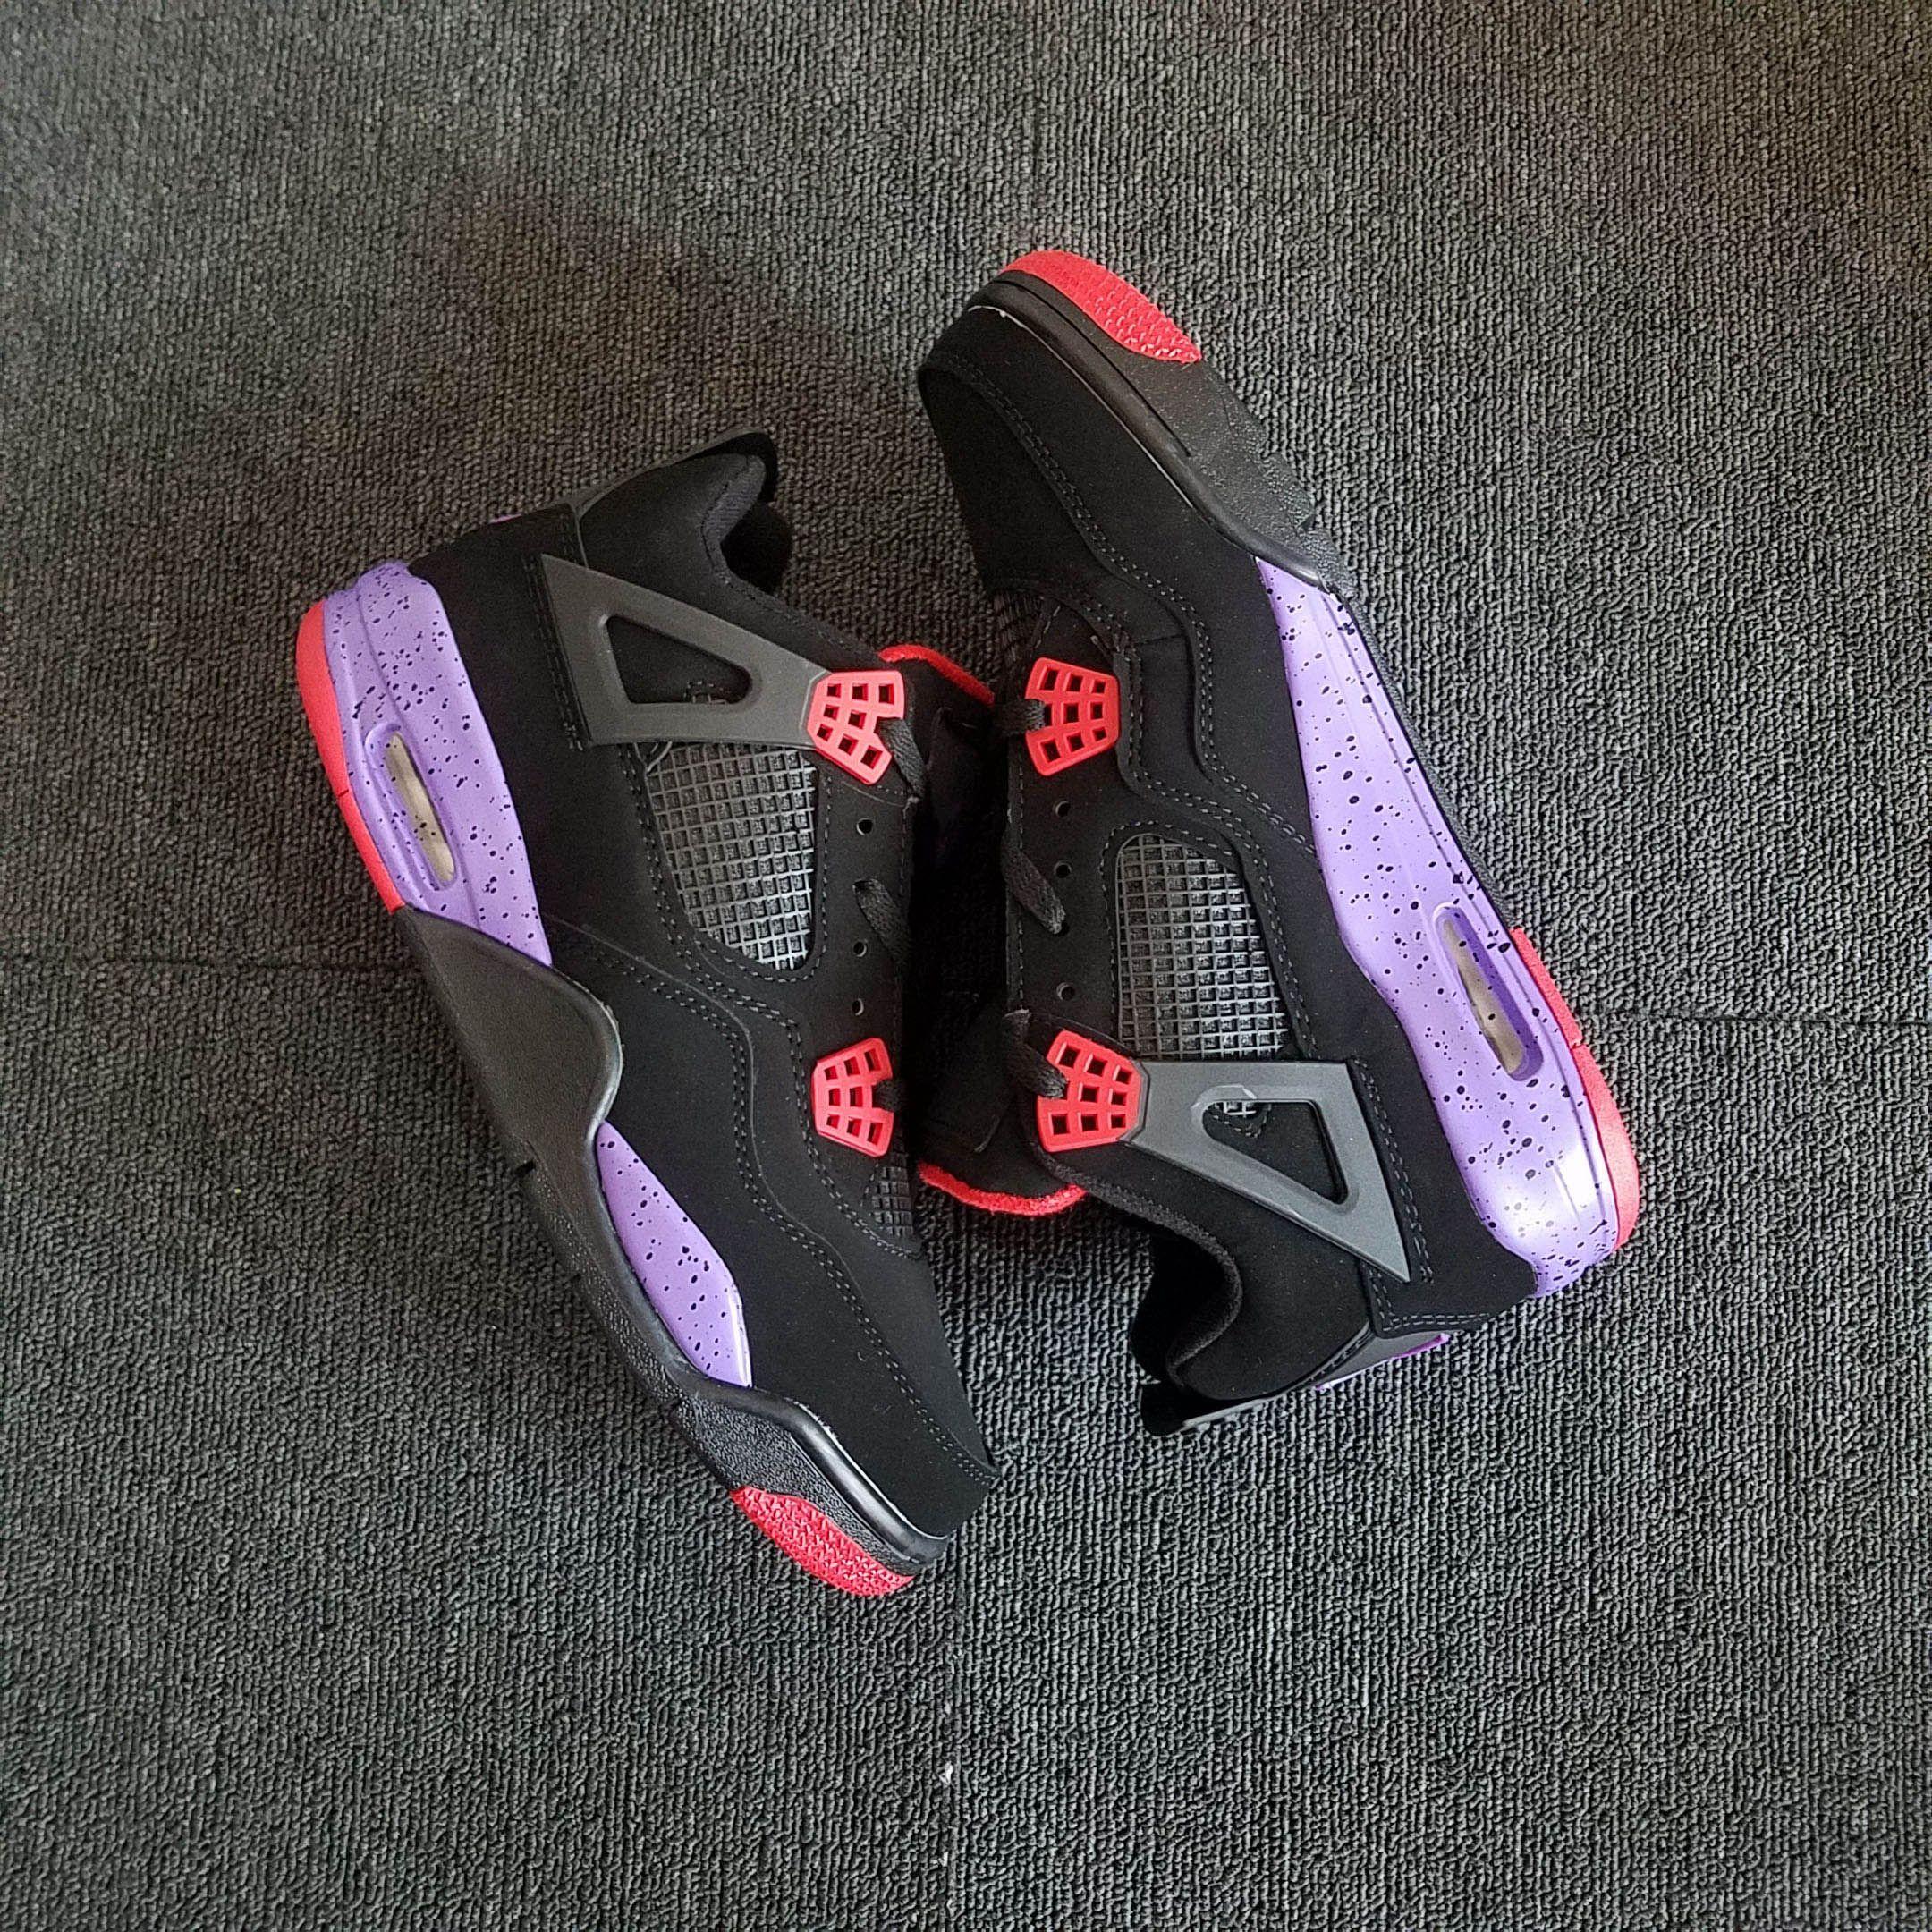 Retro Raptors Basketball Shoes Men Womens 4 Raptors Sneakers Size 36-47  Come With Box Retro Shoes Retro Basketball Shoes Gatorade Online with   137.15 Pair ... 38a91137be